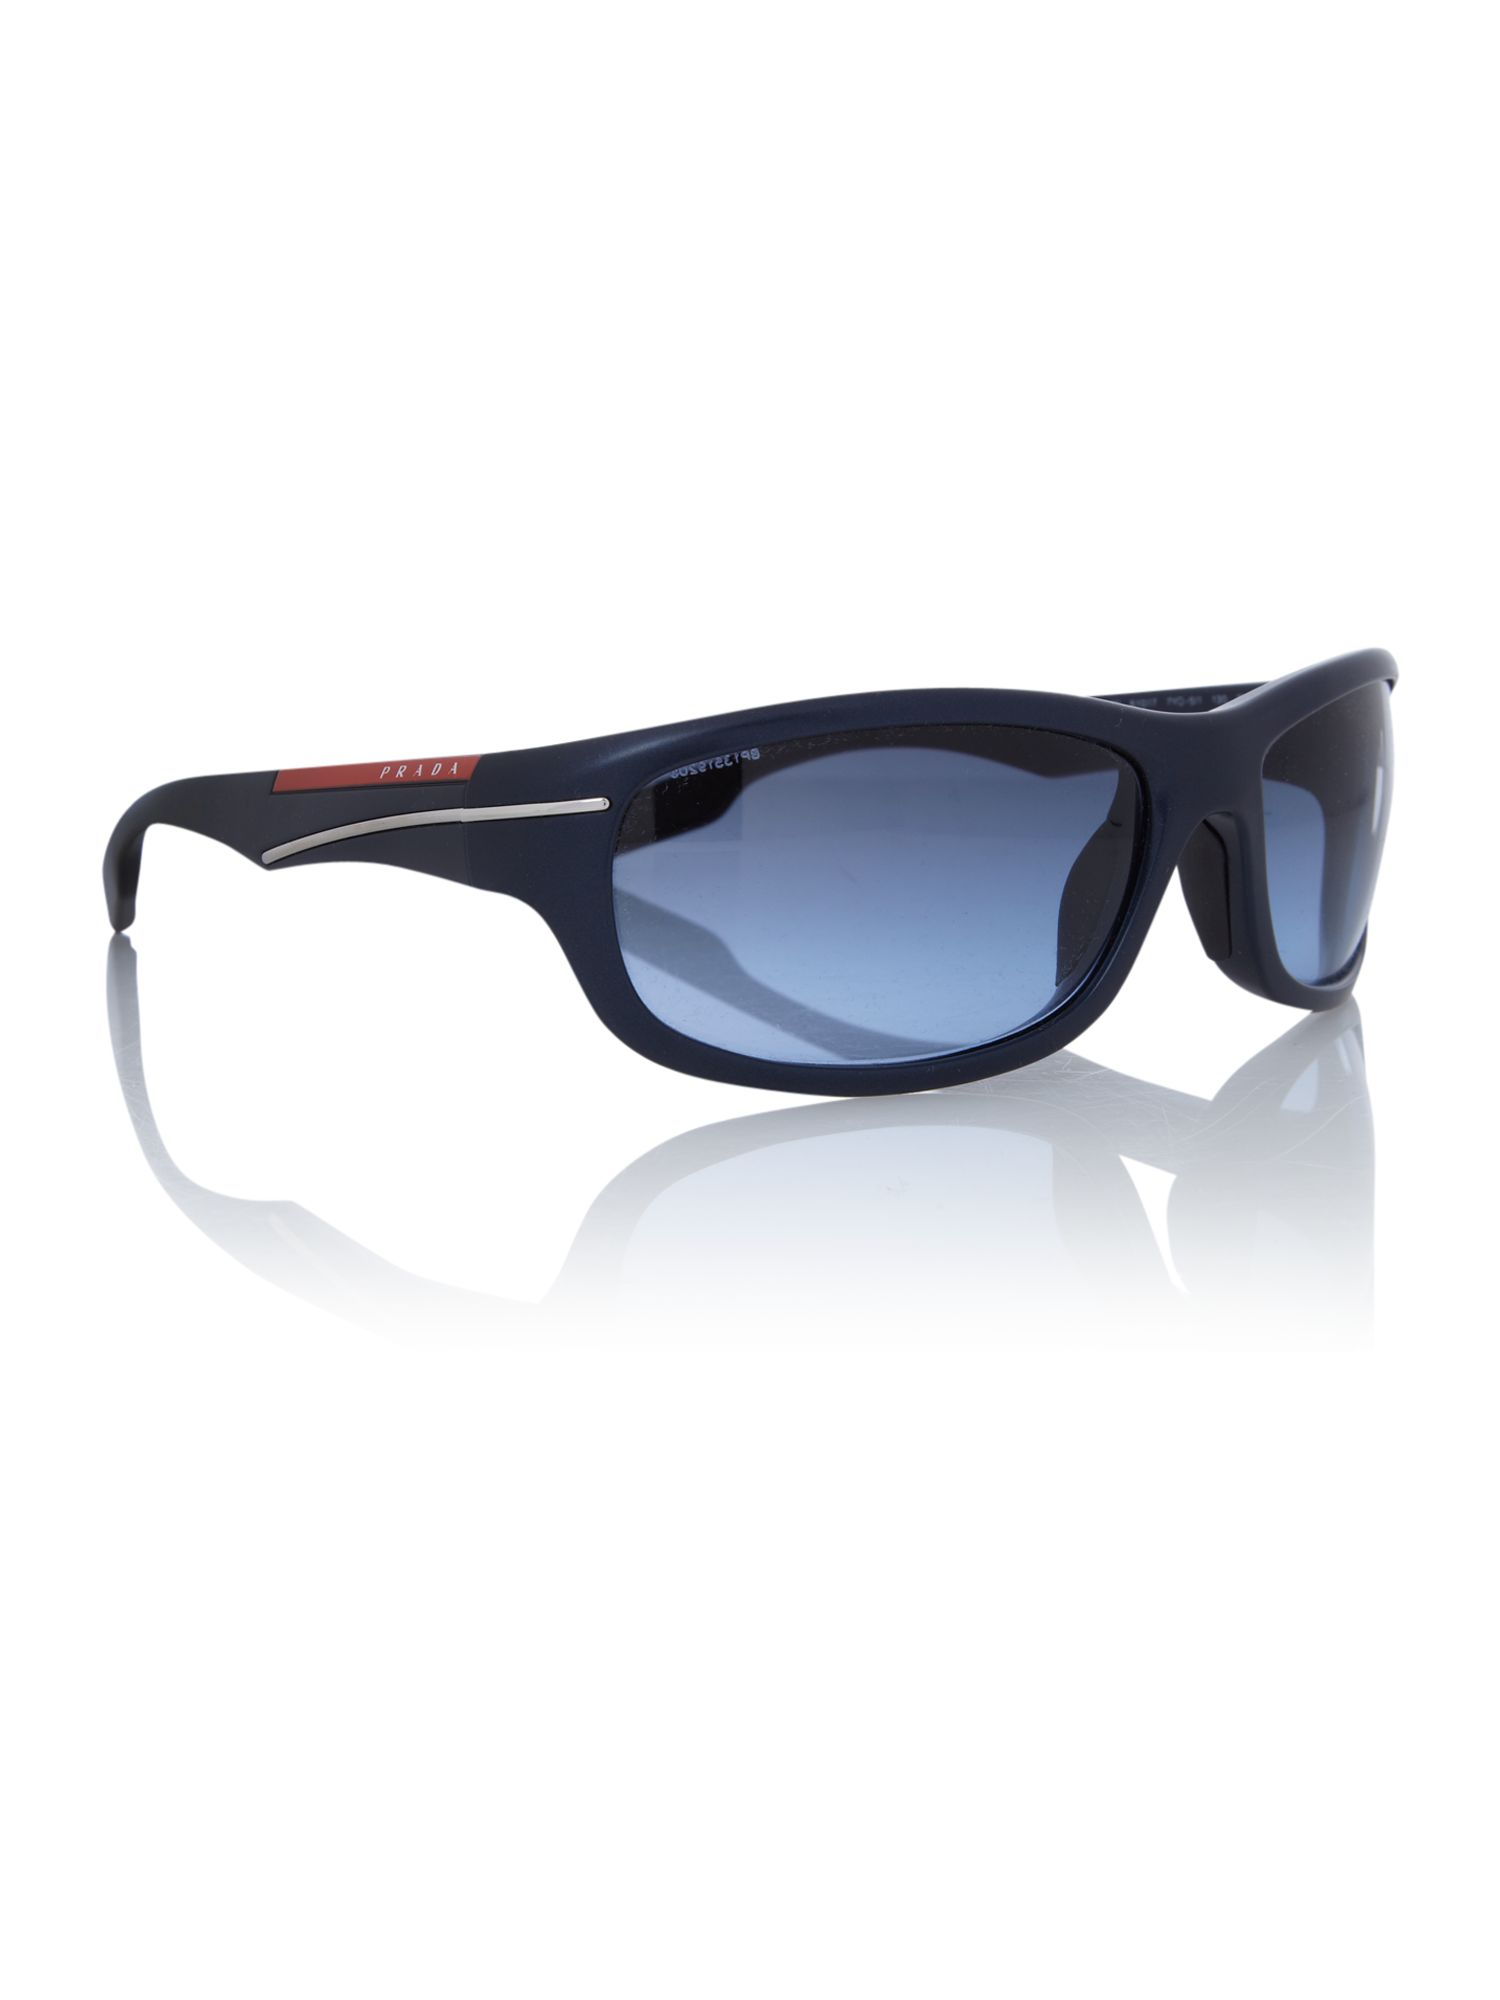 e8d81d4b62f8b Prada Sunglasses Black And Red